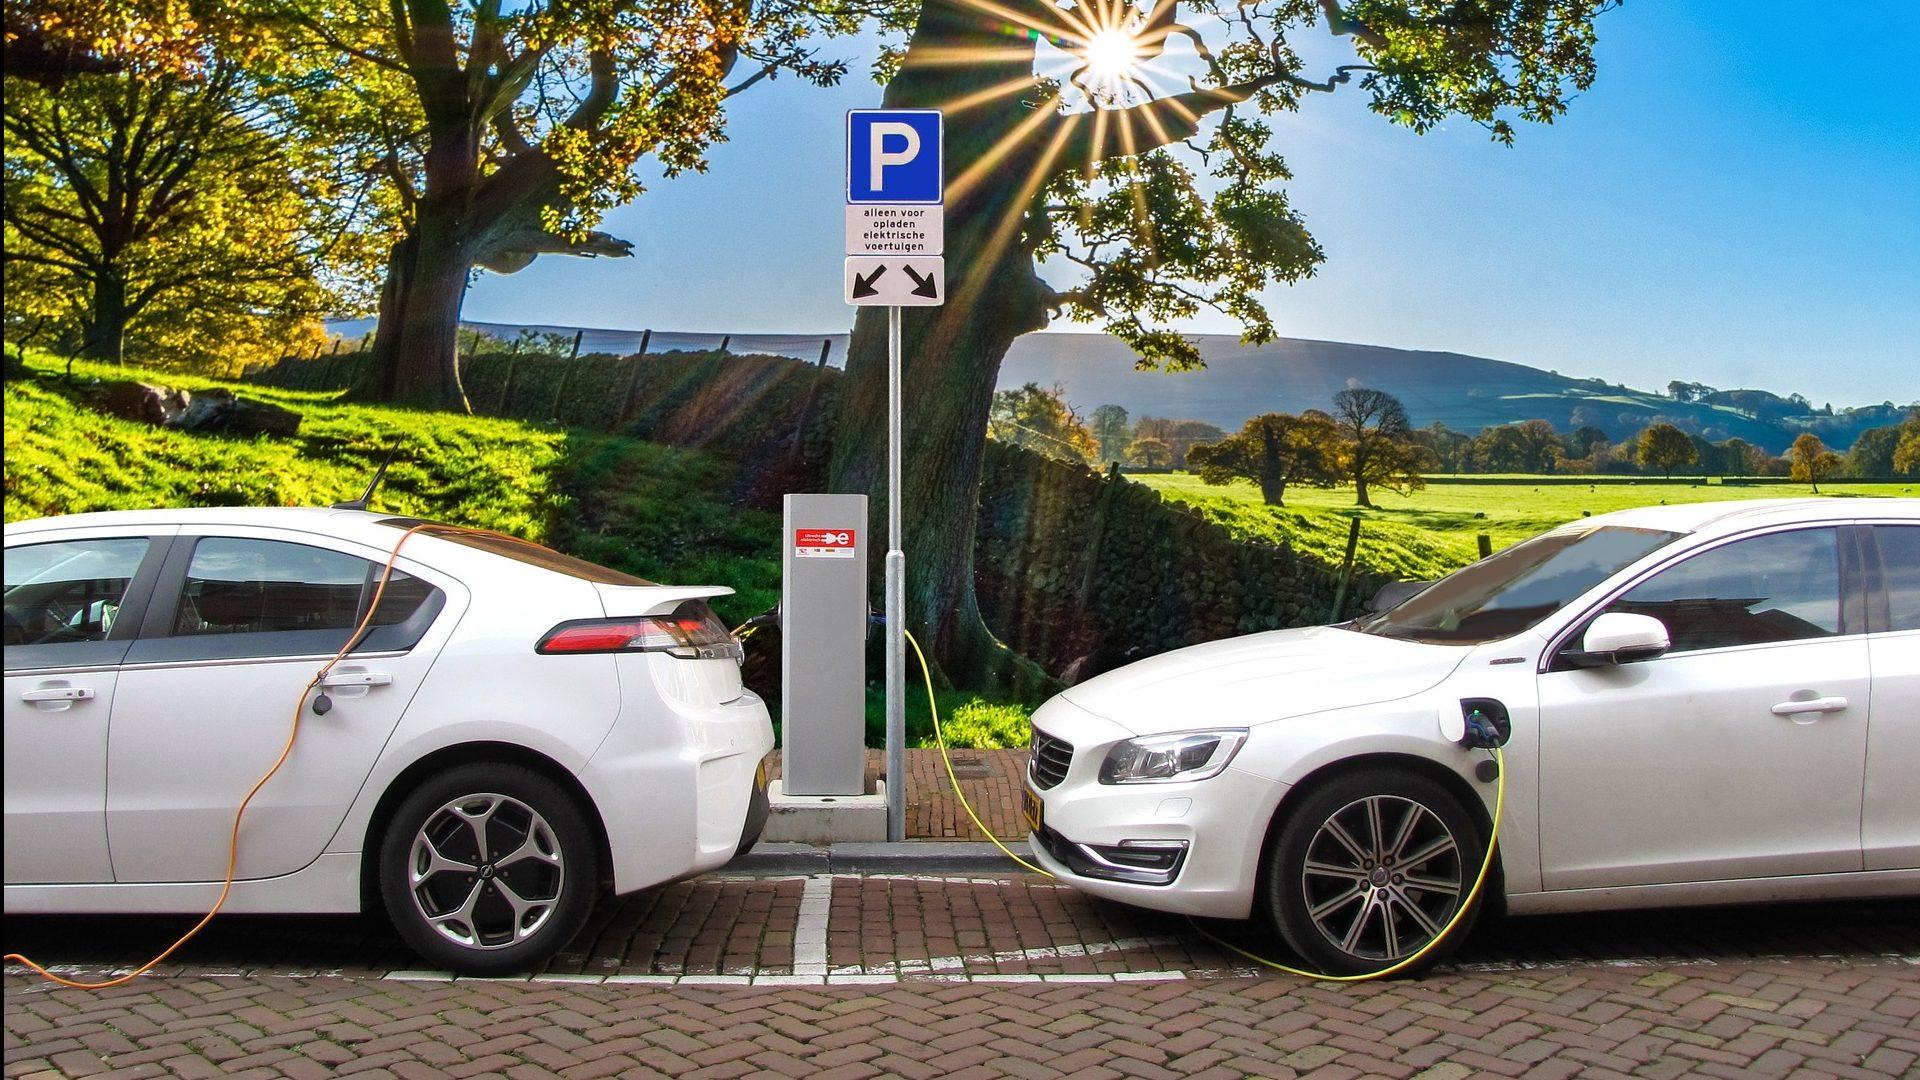 Volvo תשיק עד 2030 מכוניות חשמליות עם מוצרי ביטוח משלימים